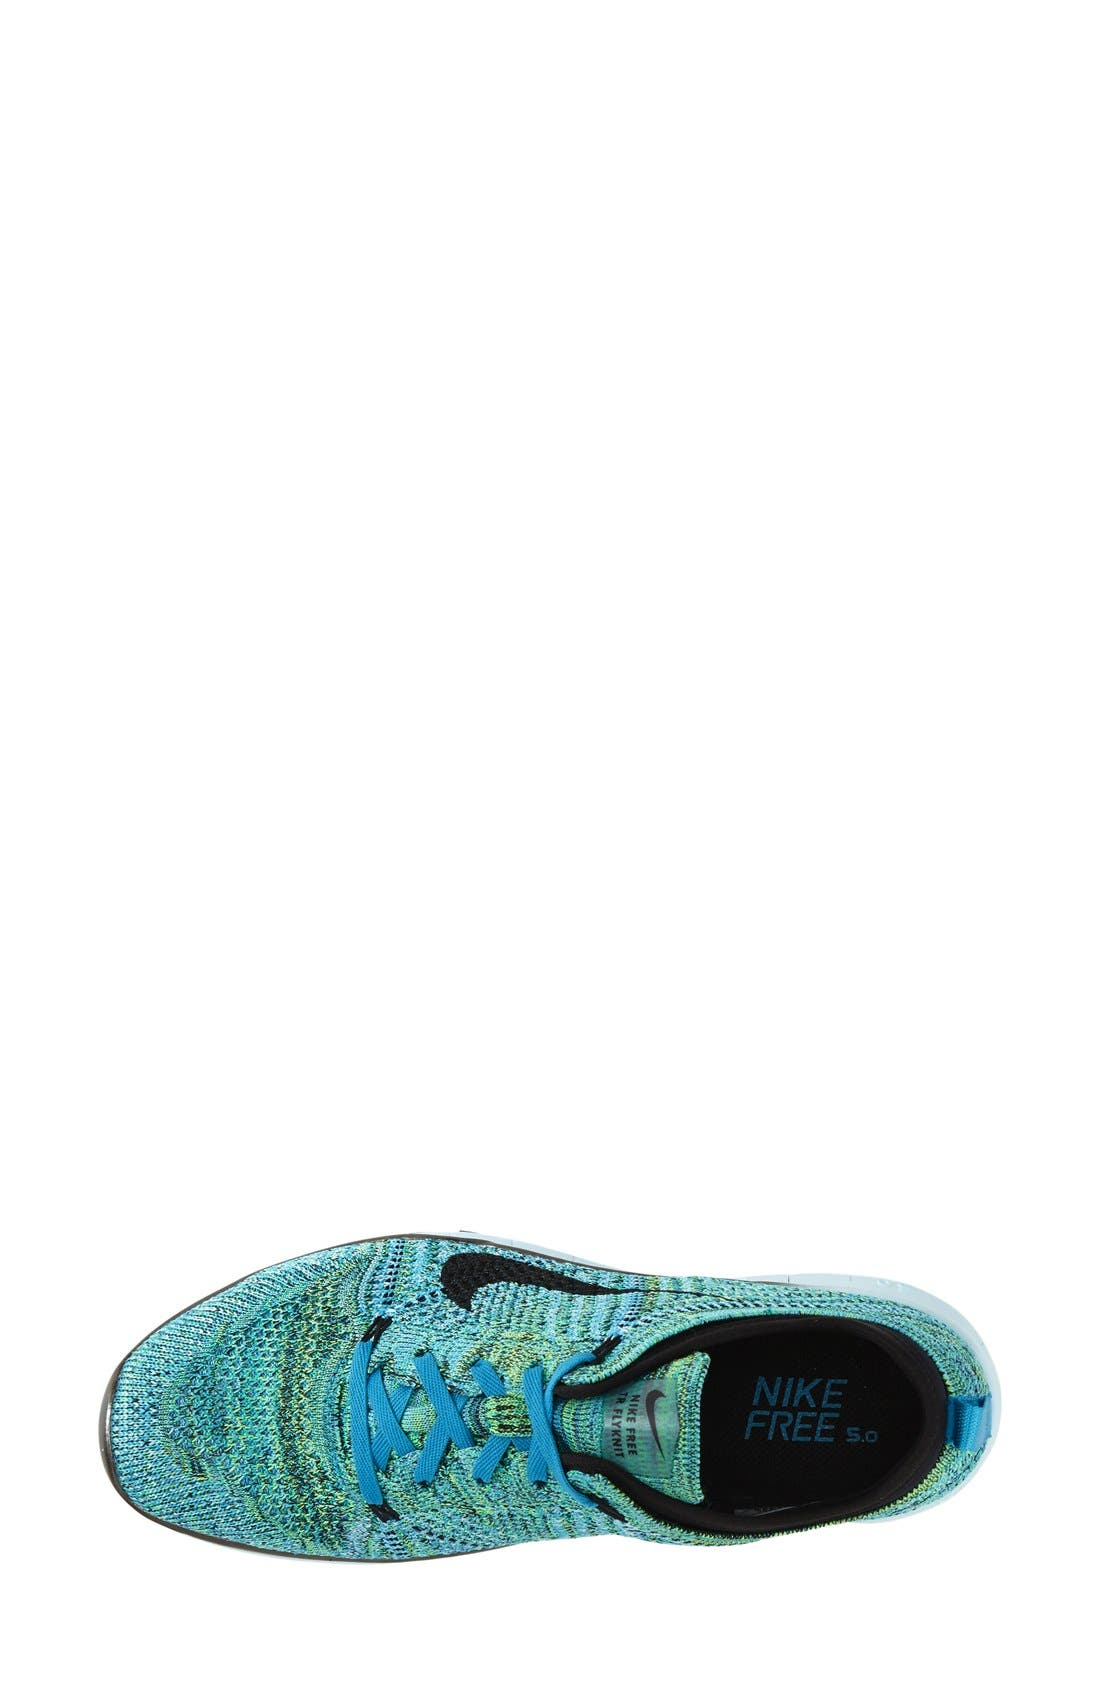 ,                             'Free Flyknit 5.0 TR' Training Shoe,                             Alternate thumbnail 39, color,                             499